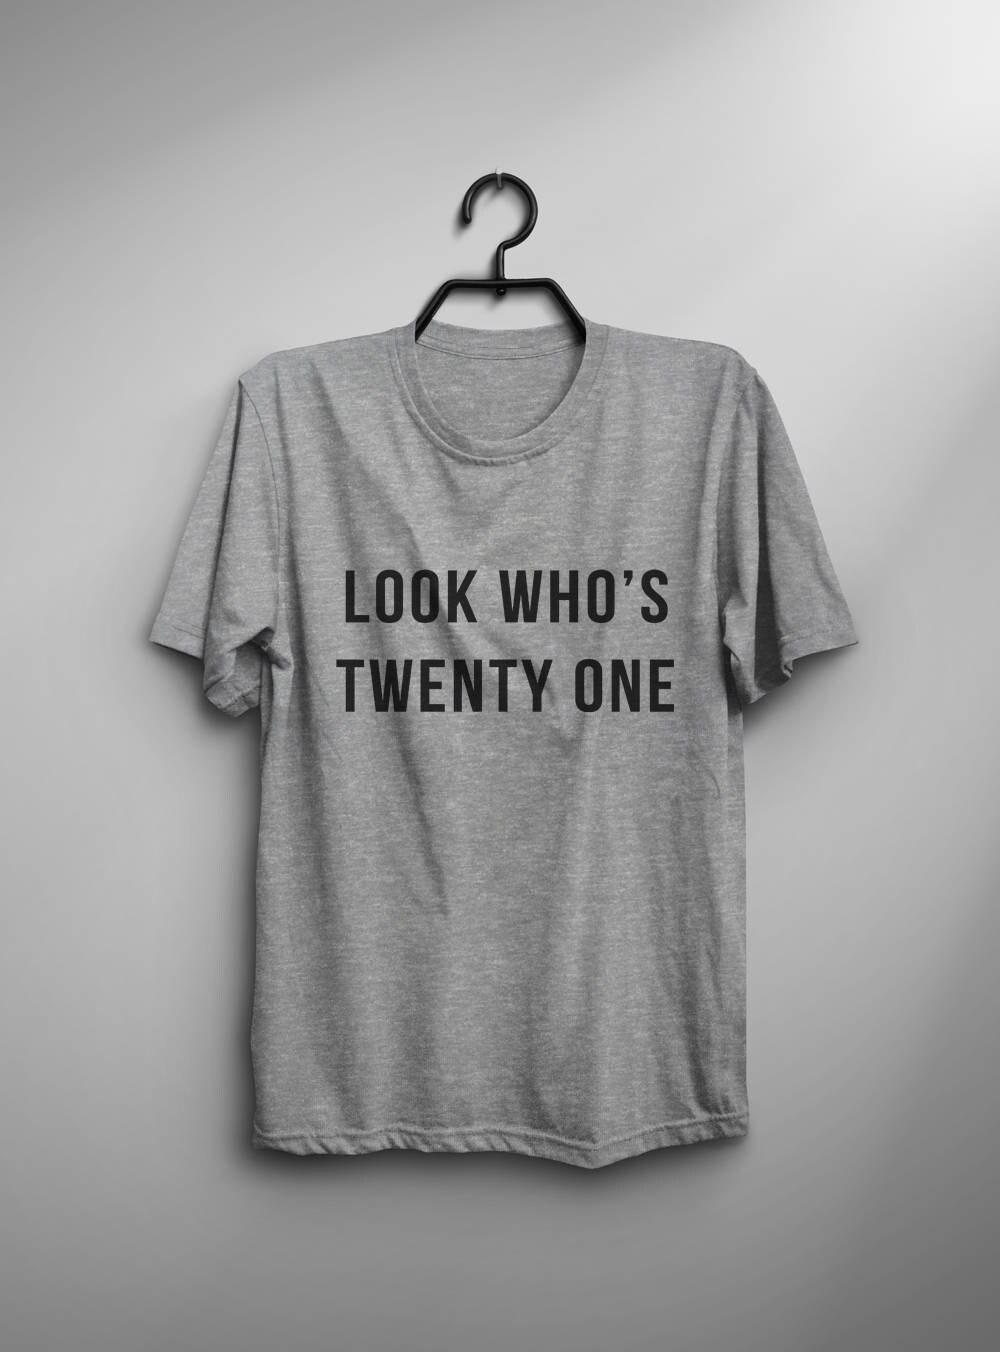 21st Birthday Shirt T Twenty First Gift Womens